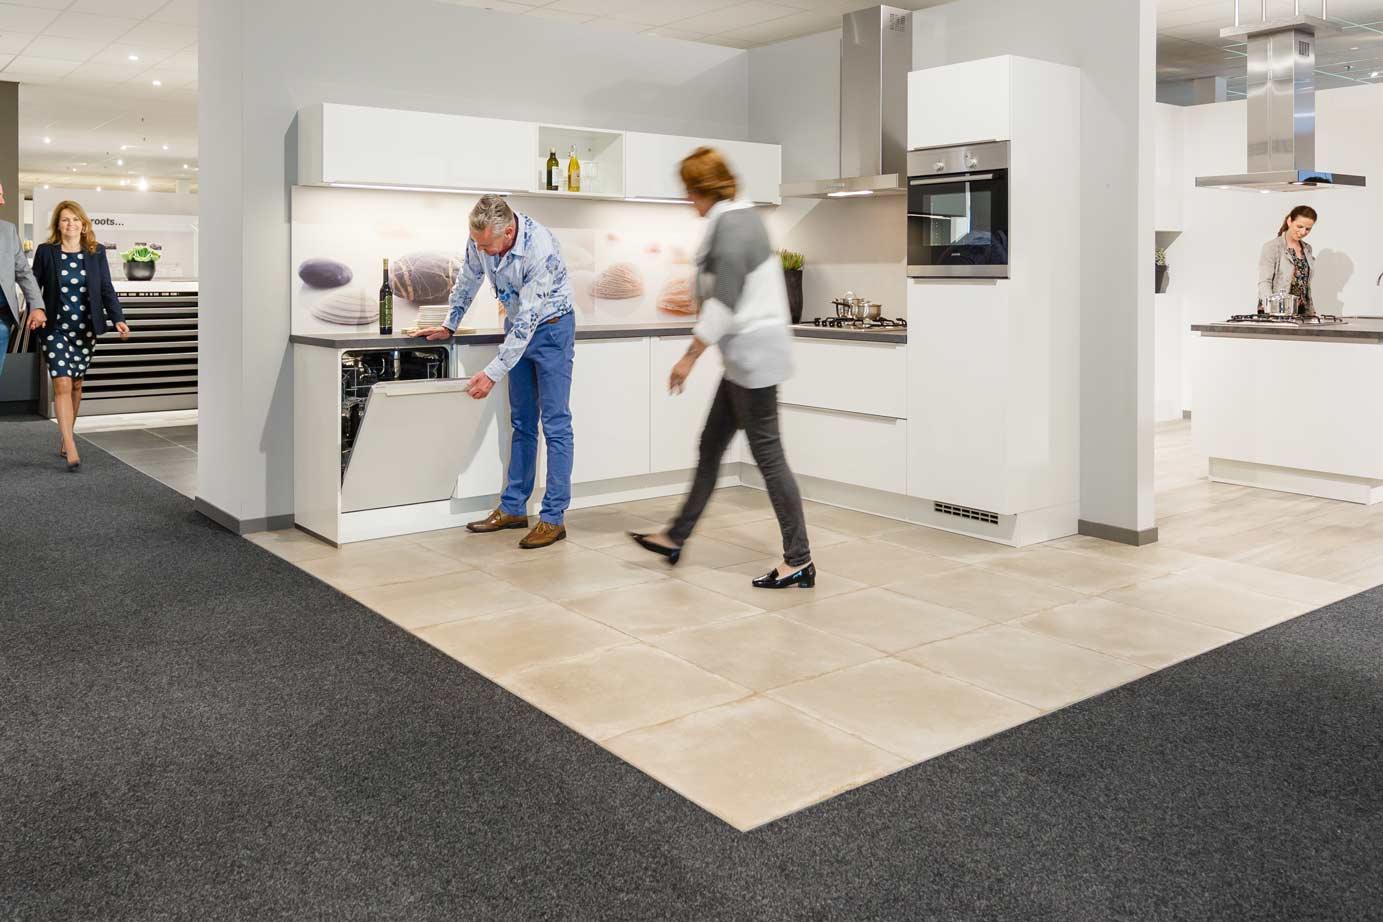 Hoek Keukens Showroom : Hoekkeukens in iedere stijl en budget arma